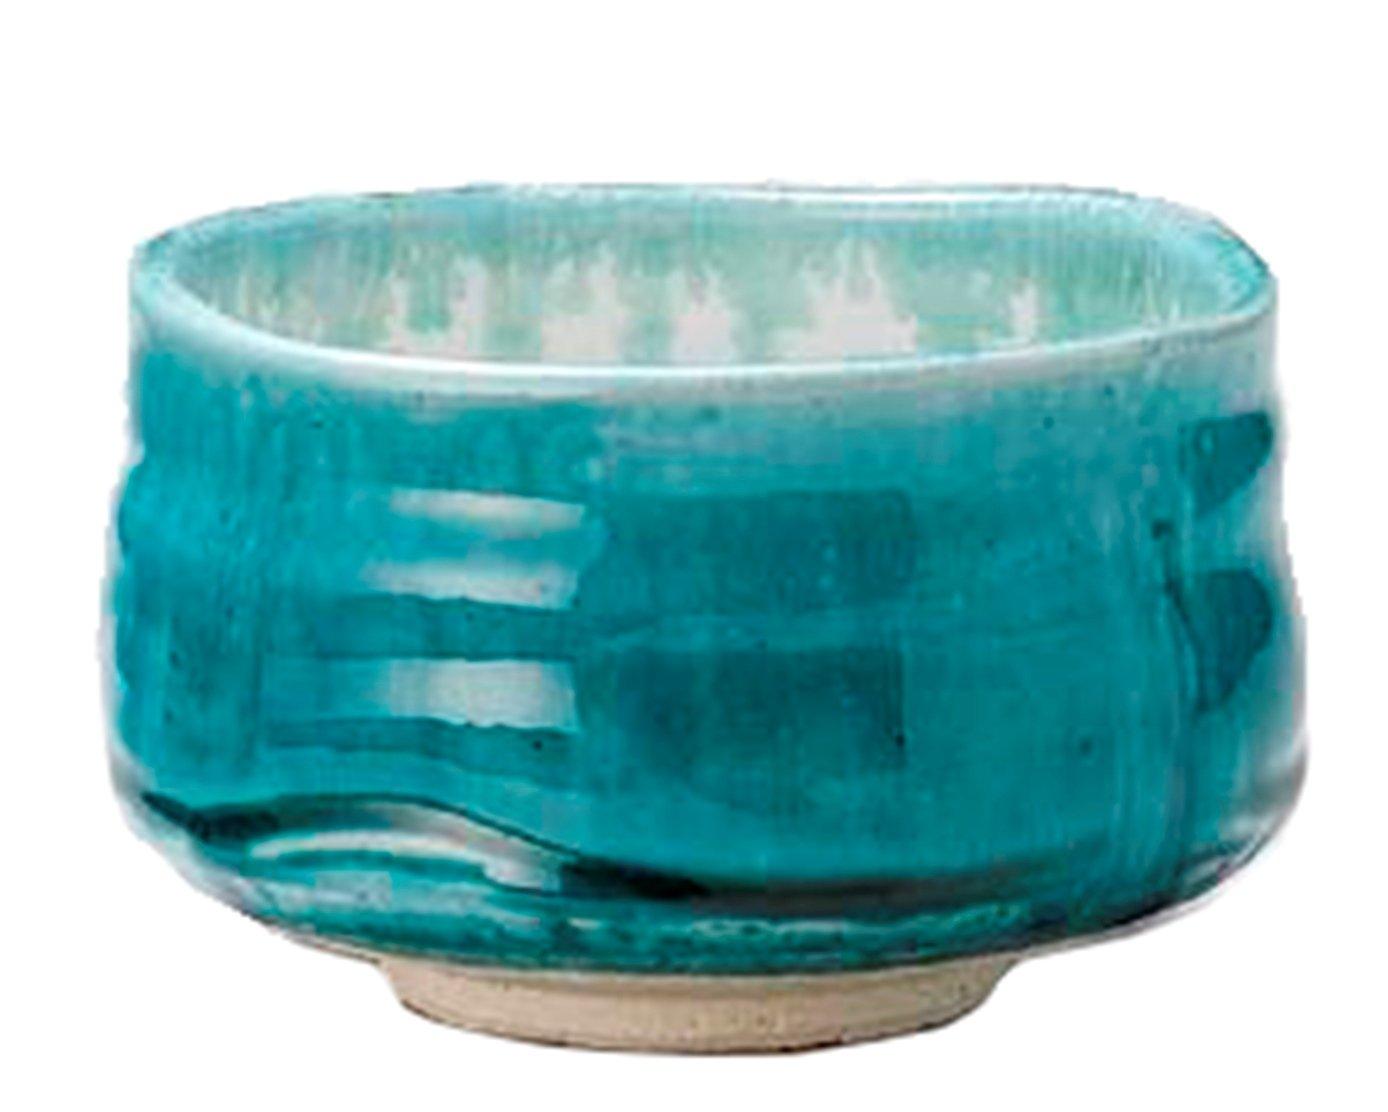 Mino-yaki Matcha Tea Bowl Turquoise Blue [Japan Import] by Mino Ware Minoyaki L-1774